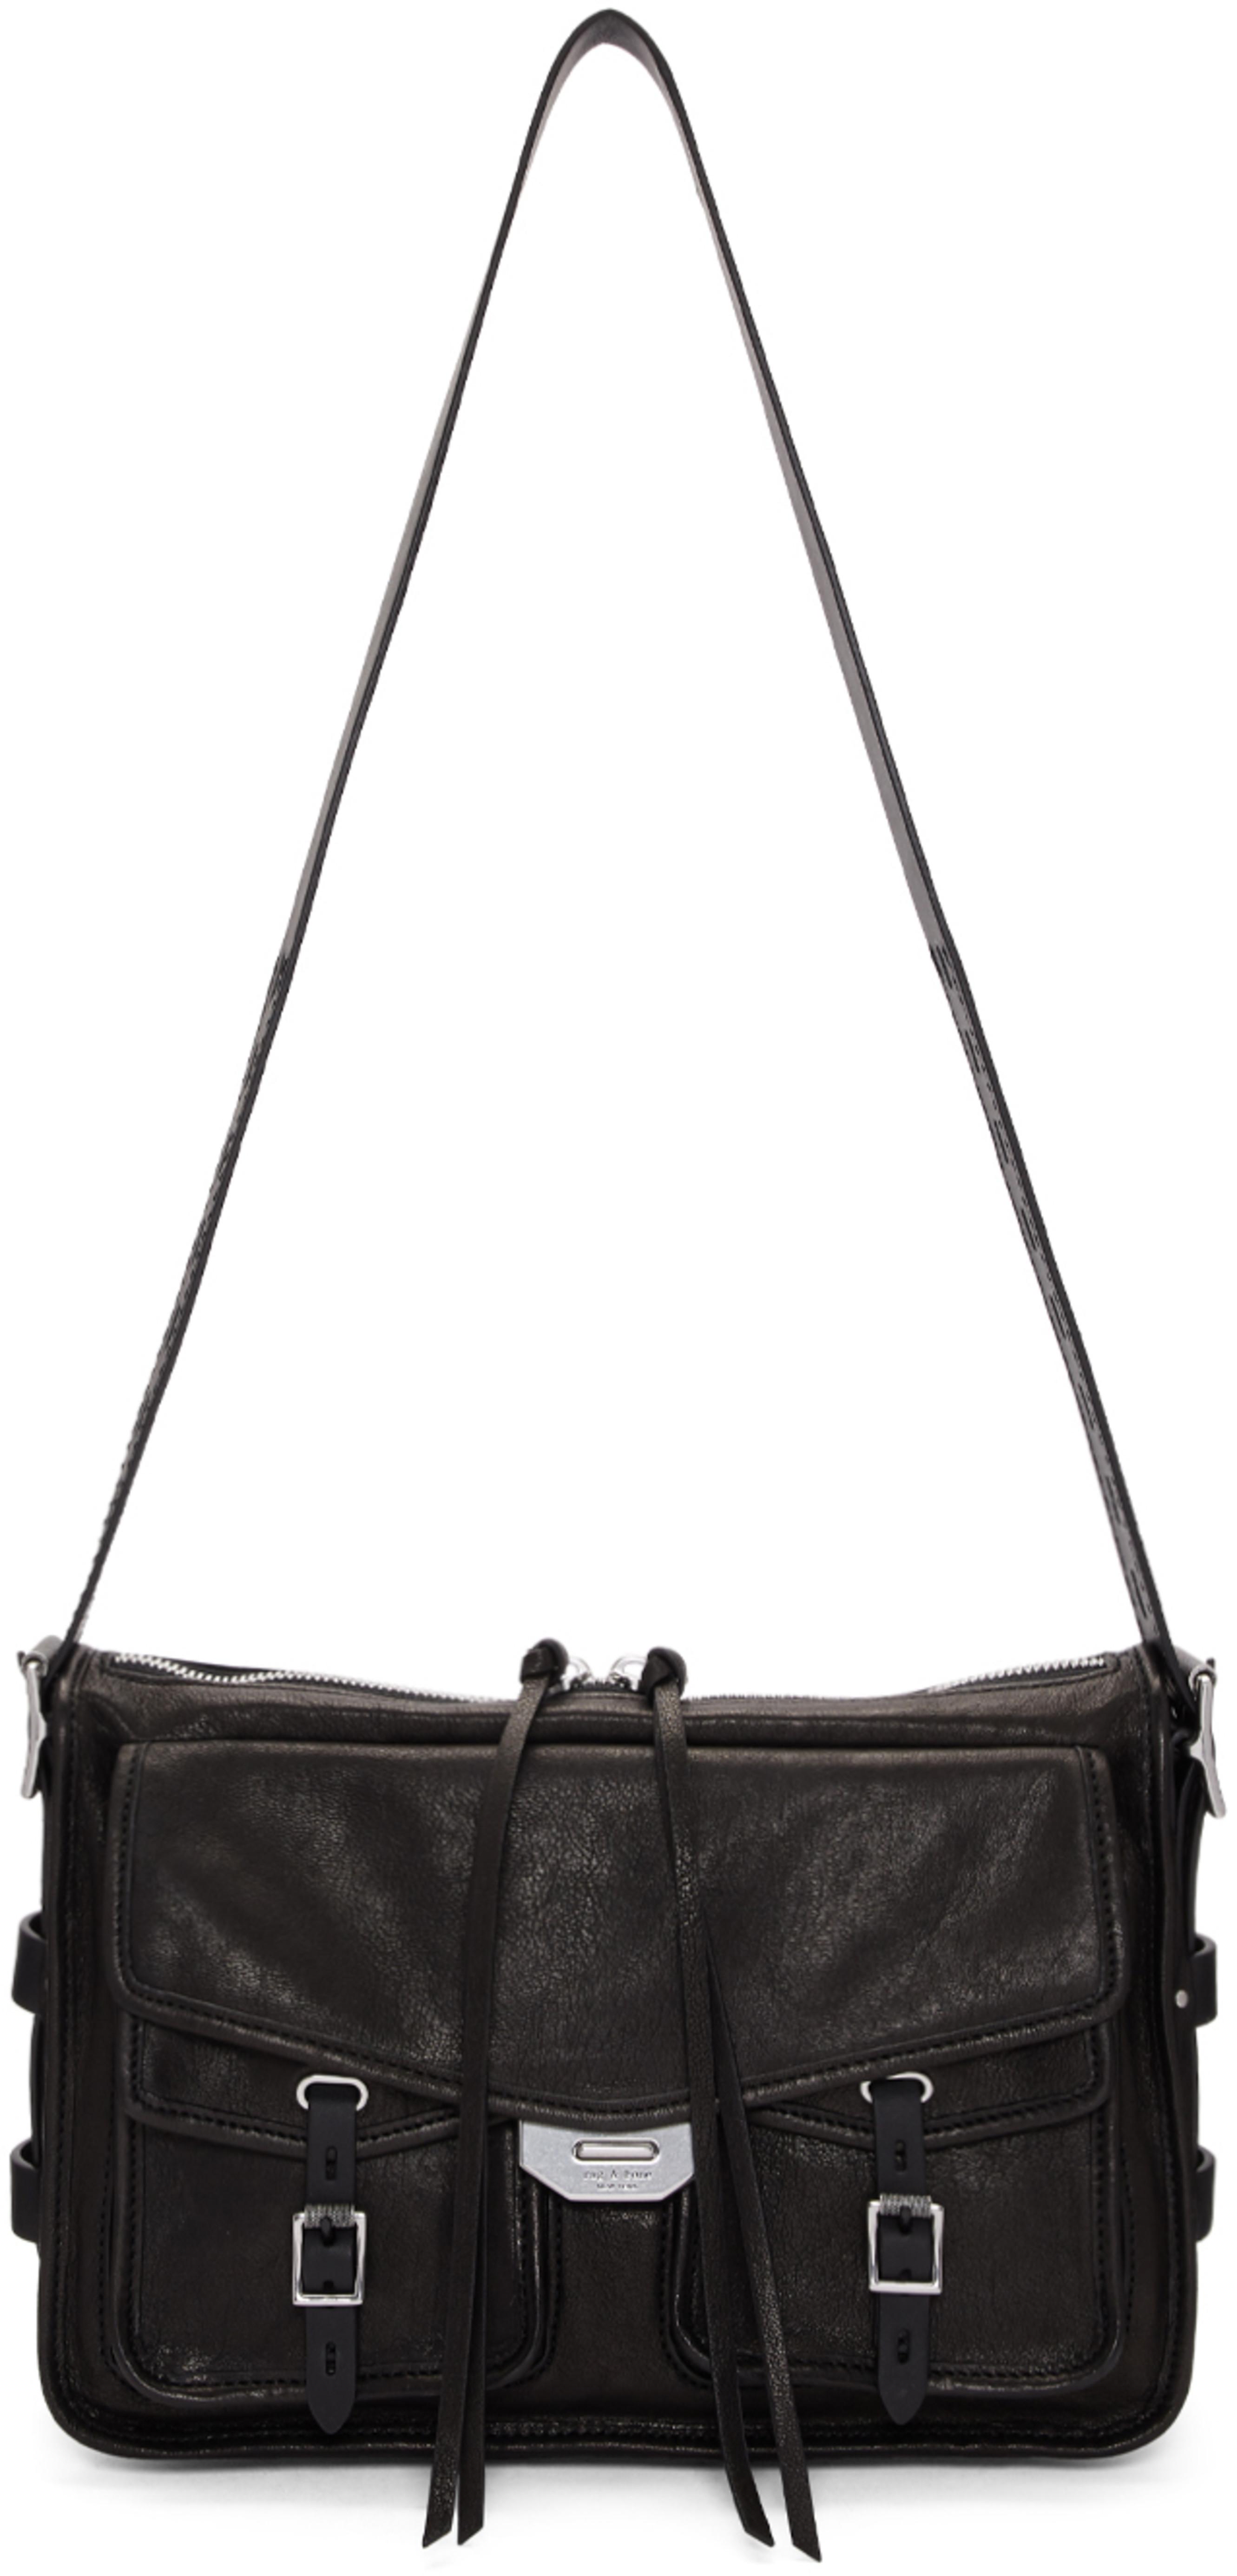 2d7dcb0de09 Designer bags for Women